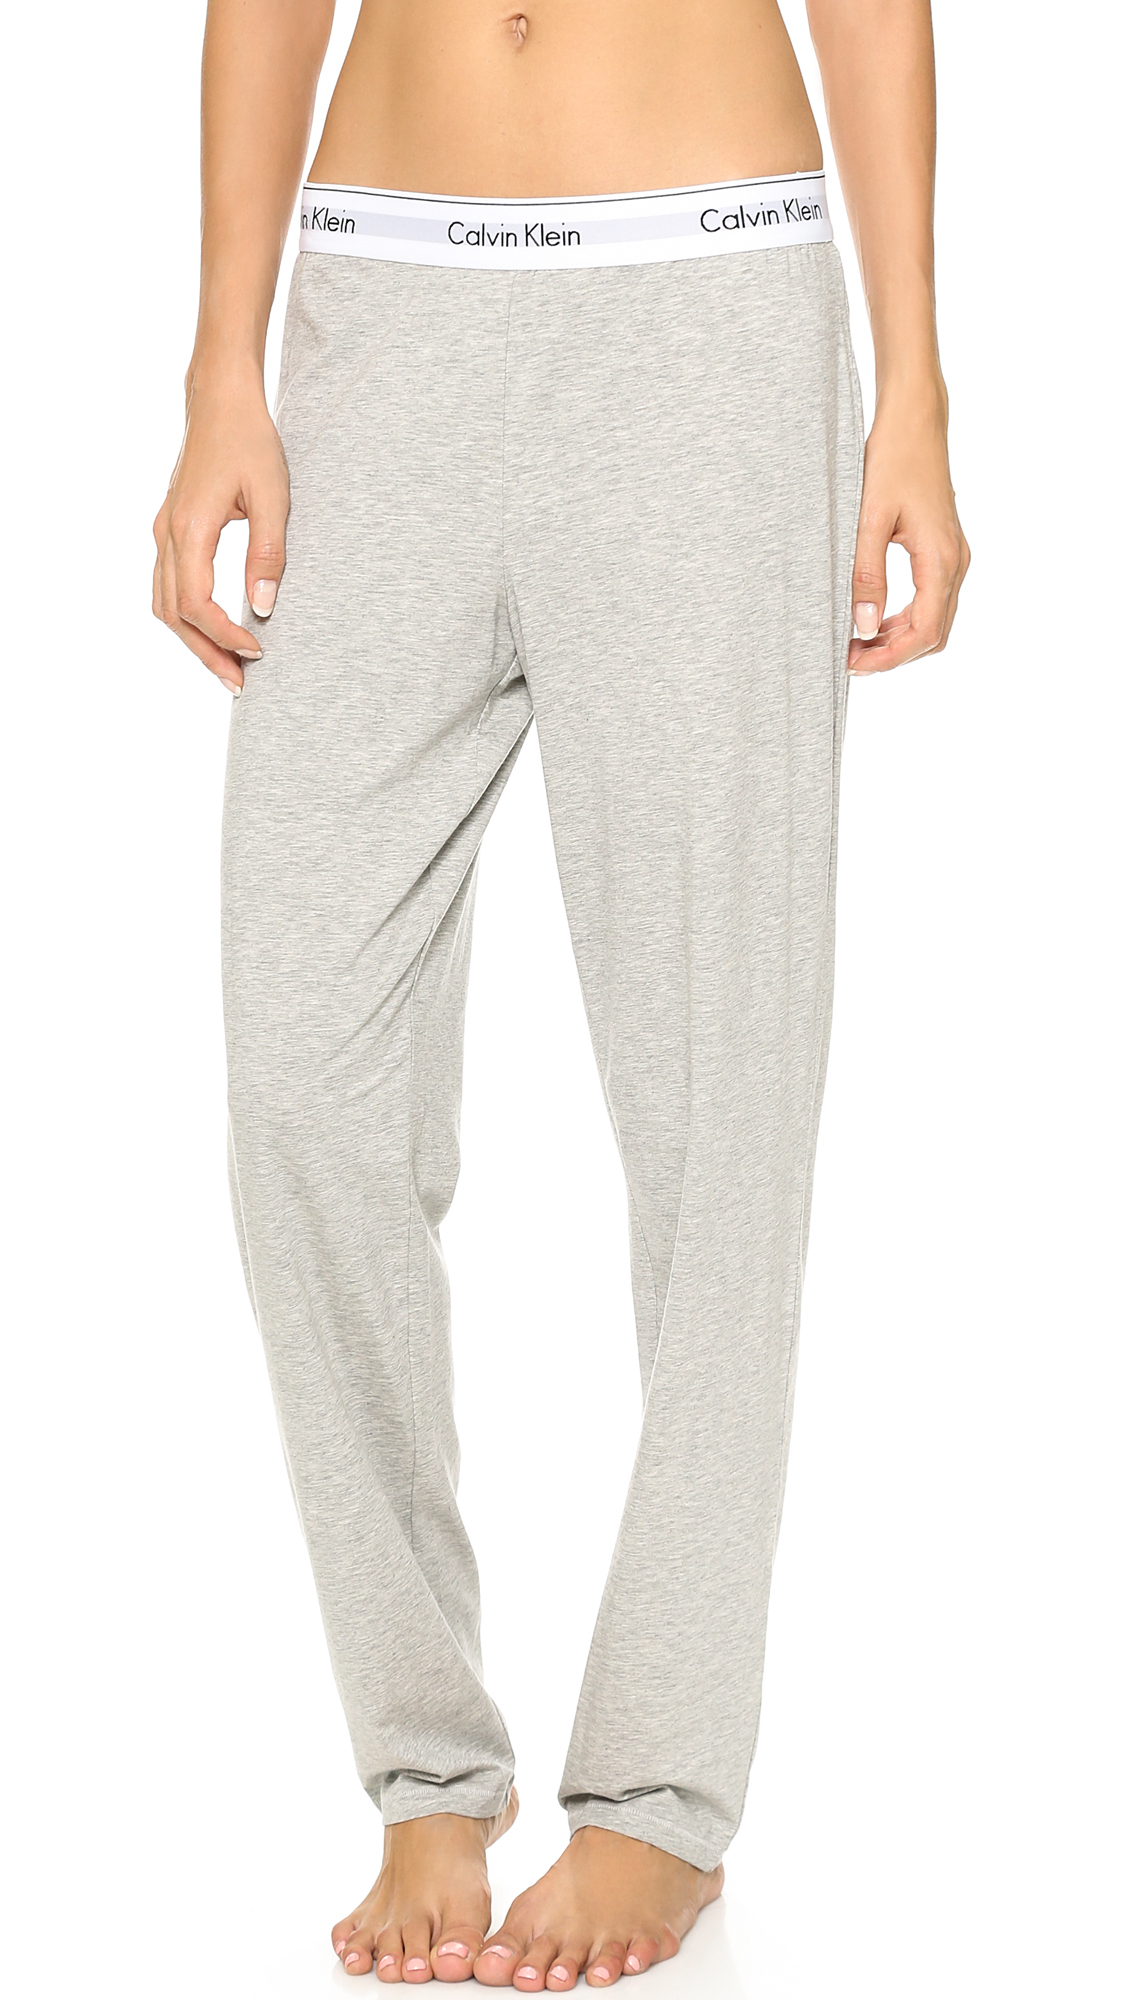 calvin klein modern cotton wide pants grey heather in. Black Bedroom Furniture Sets. Home Design Ideas